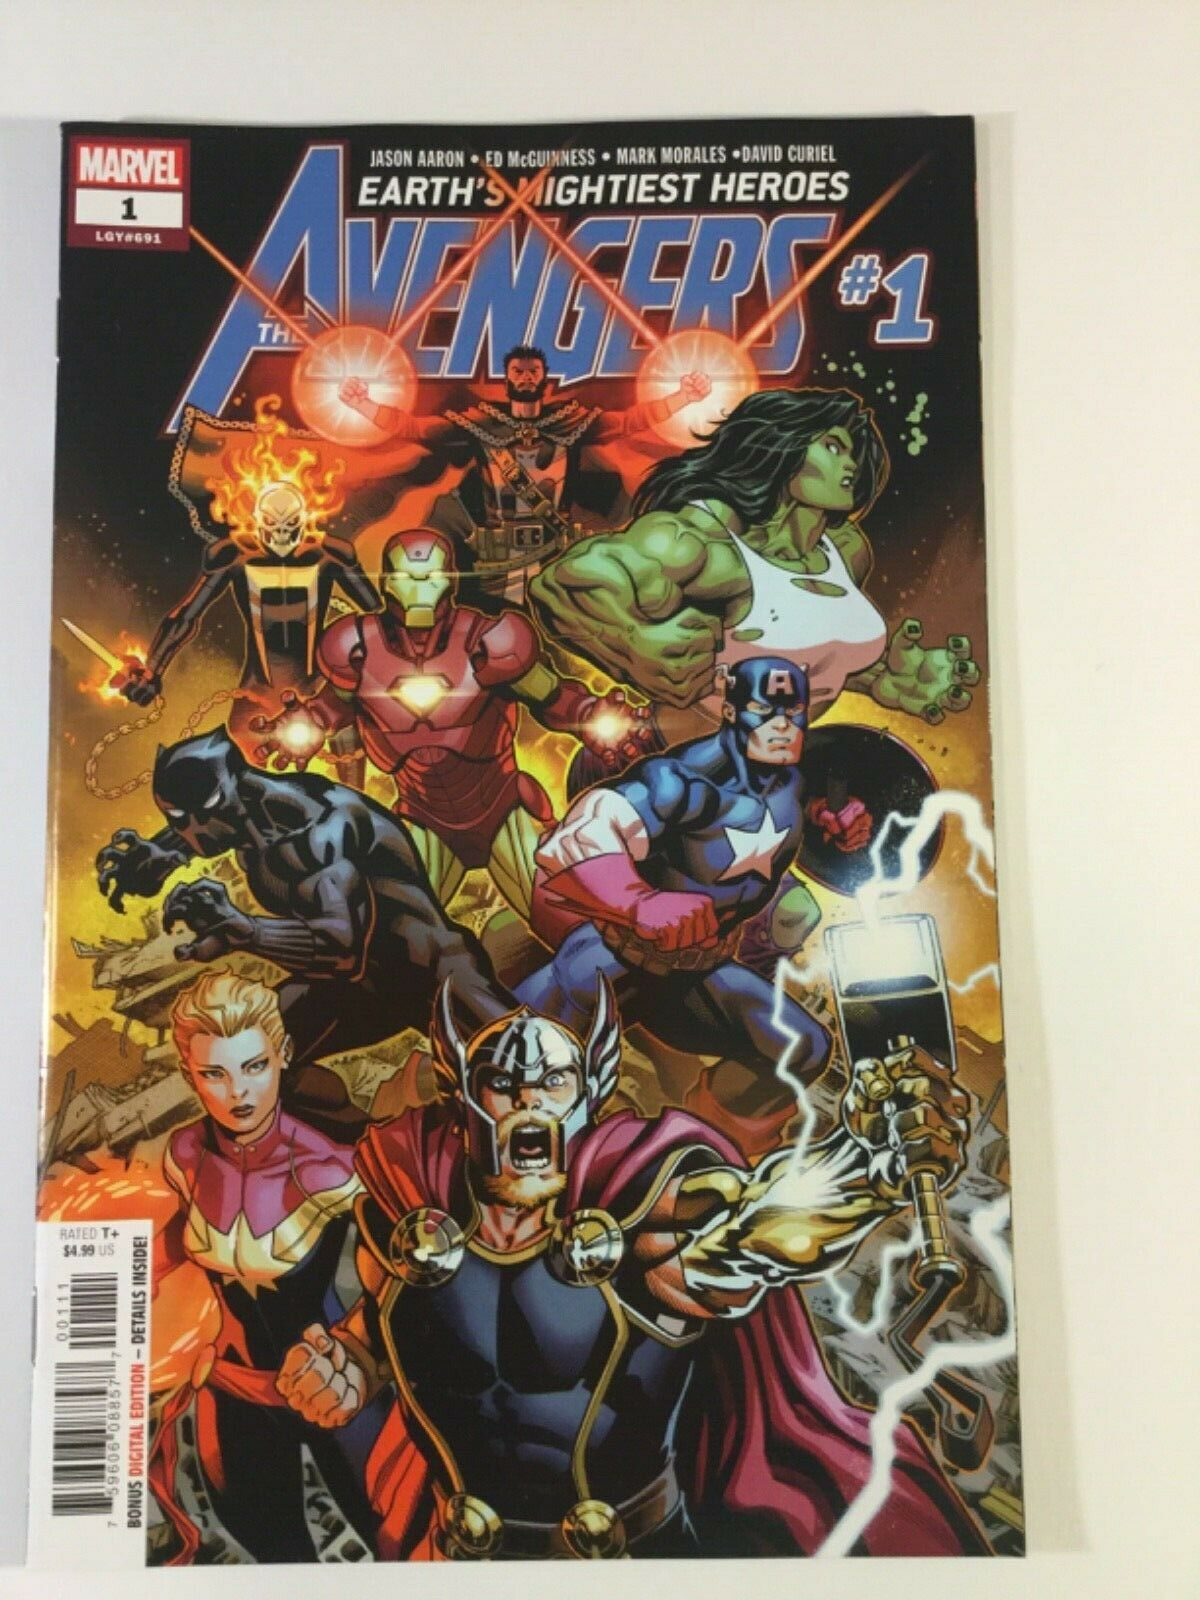 Marvel Comics AVENGERS Lot 54 Comics (Avengers, U.S.Avengers) FREE SHIPPING